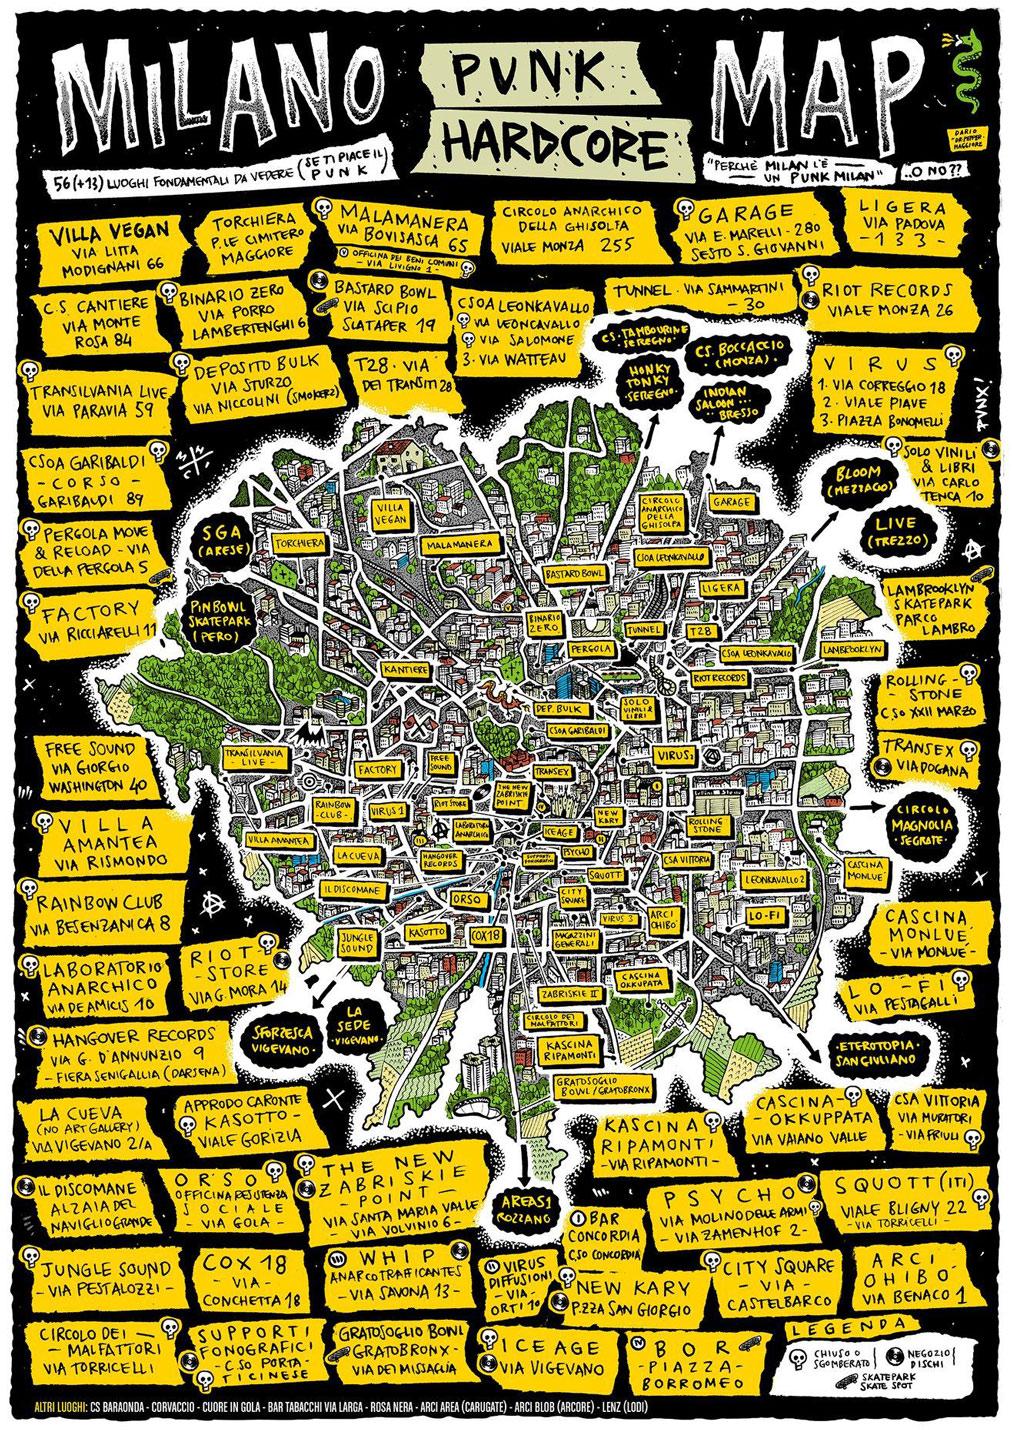 Quarantena, Milano Punk Hardcore Map